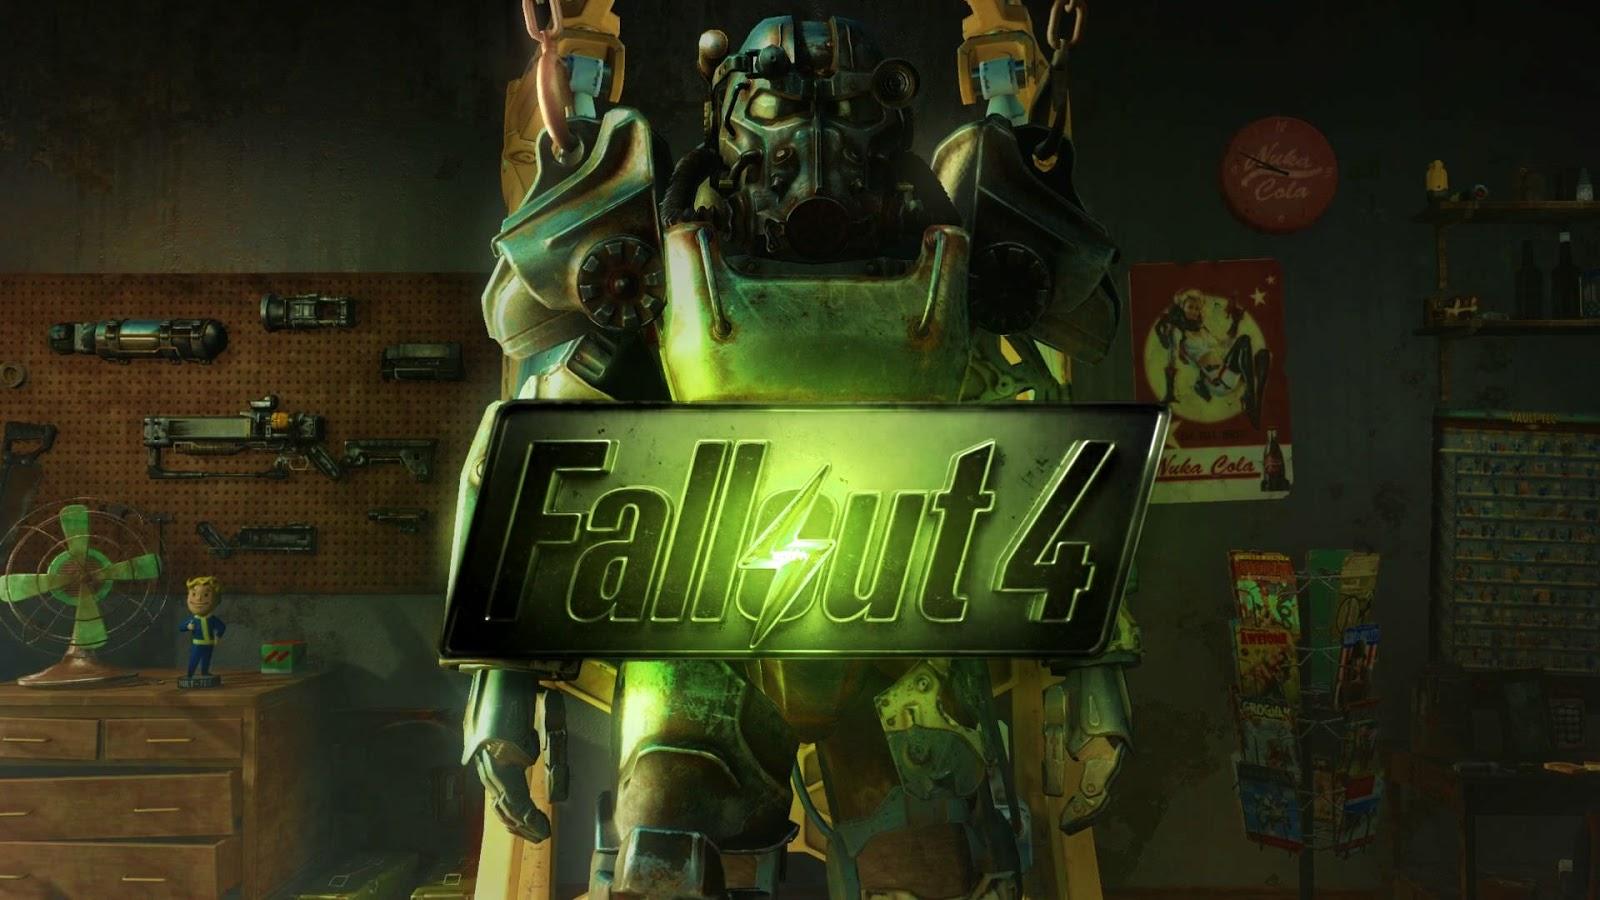 Download Fallout 4 wallpaper